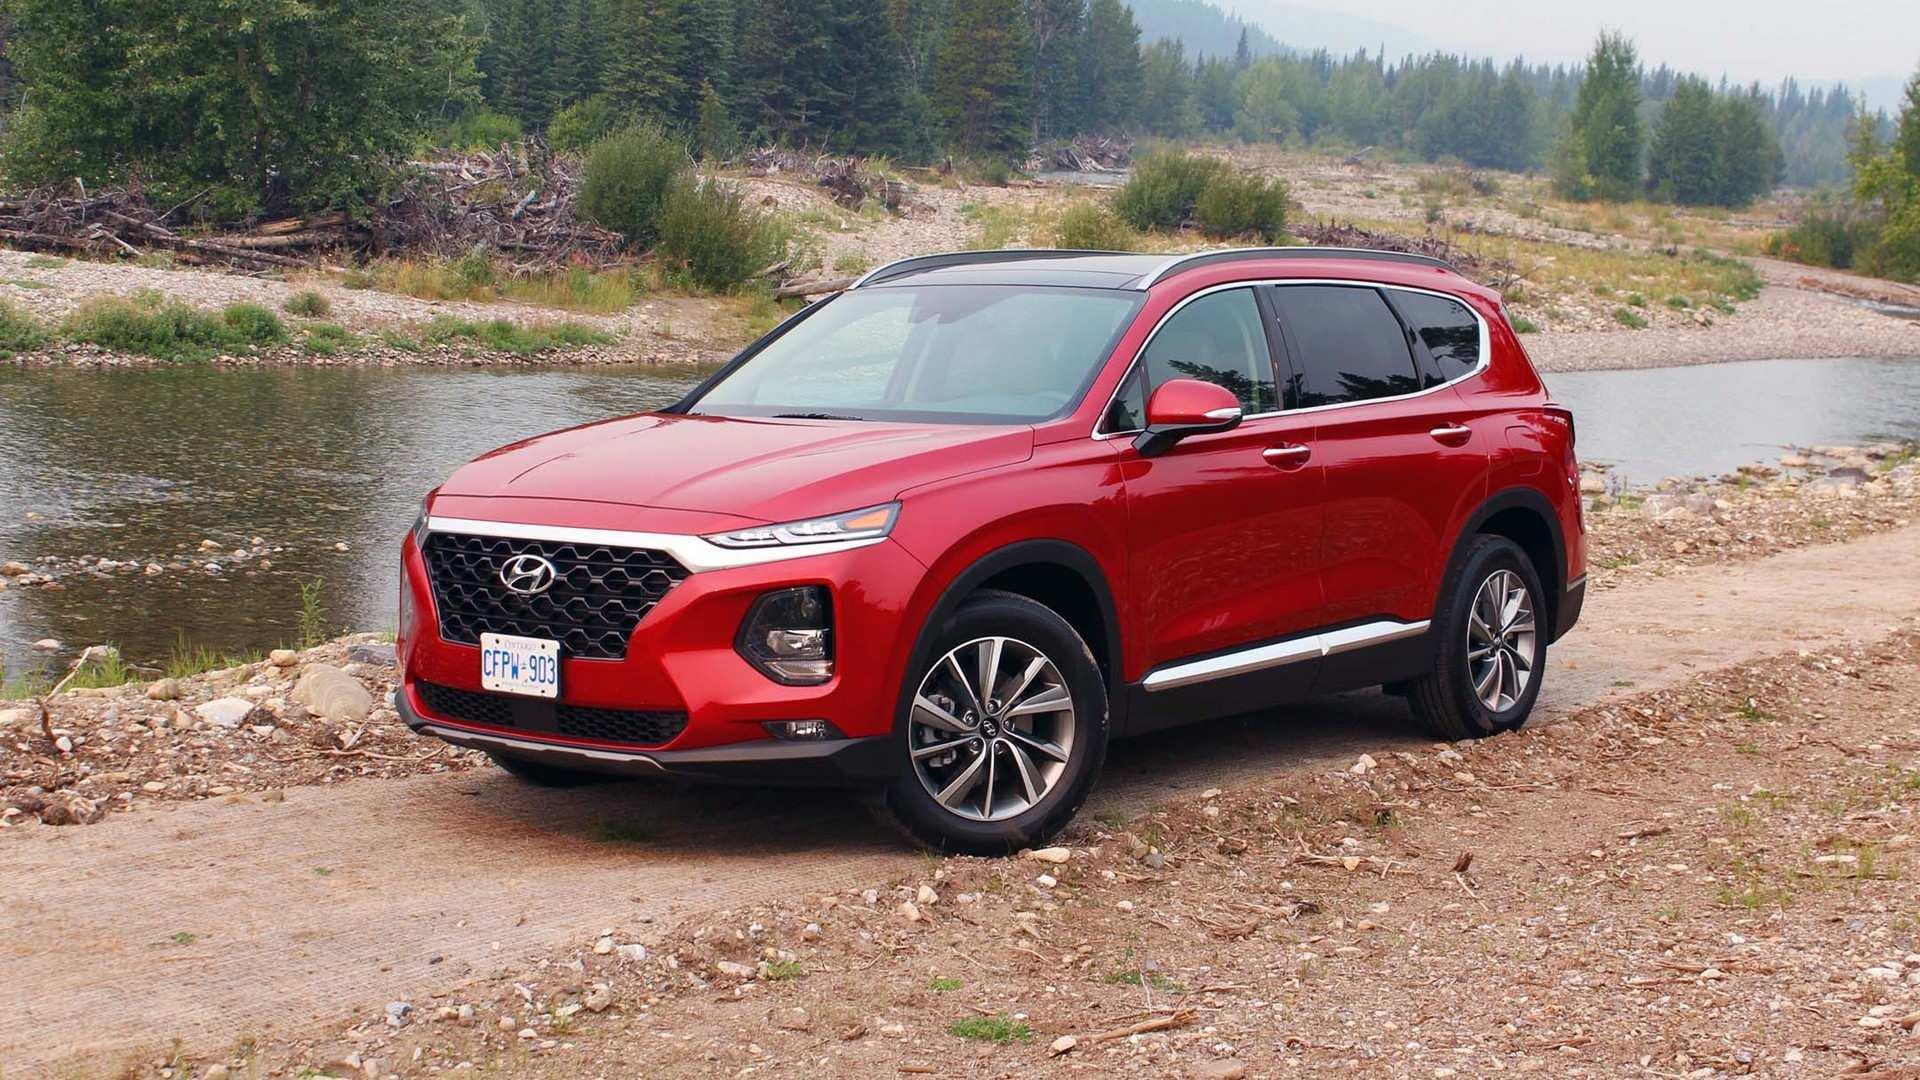 78 The 2019 Hyundai Santa Fe Test Drive Images for 2019 Hyundai Santa Fe Test Drive